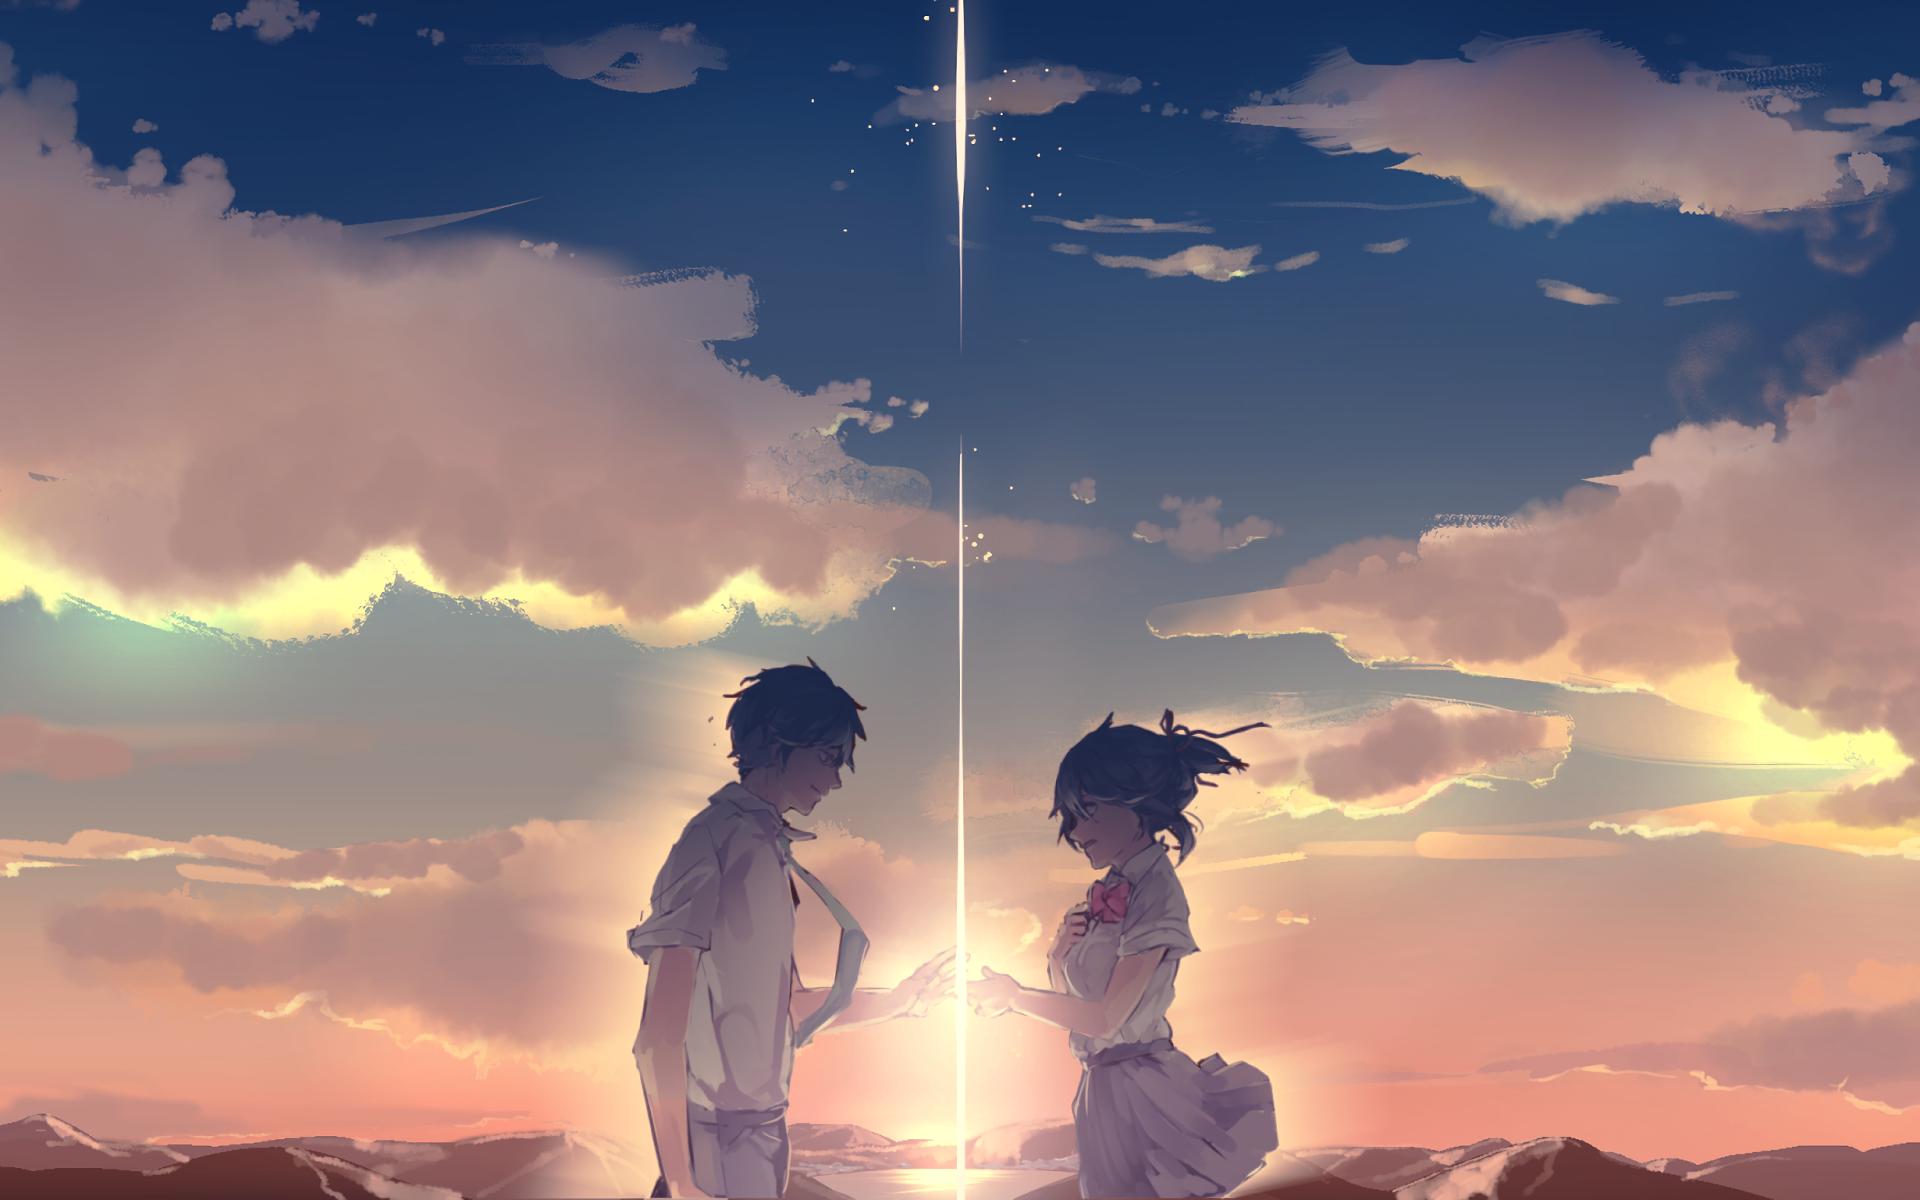 Your Name Your Name Anime 1920x1200 In 2020 Kimi No Na Wa Wallpaper Kimi No Na Wa Your Name Anime